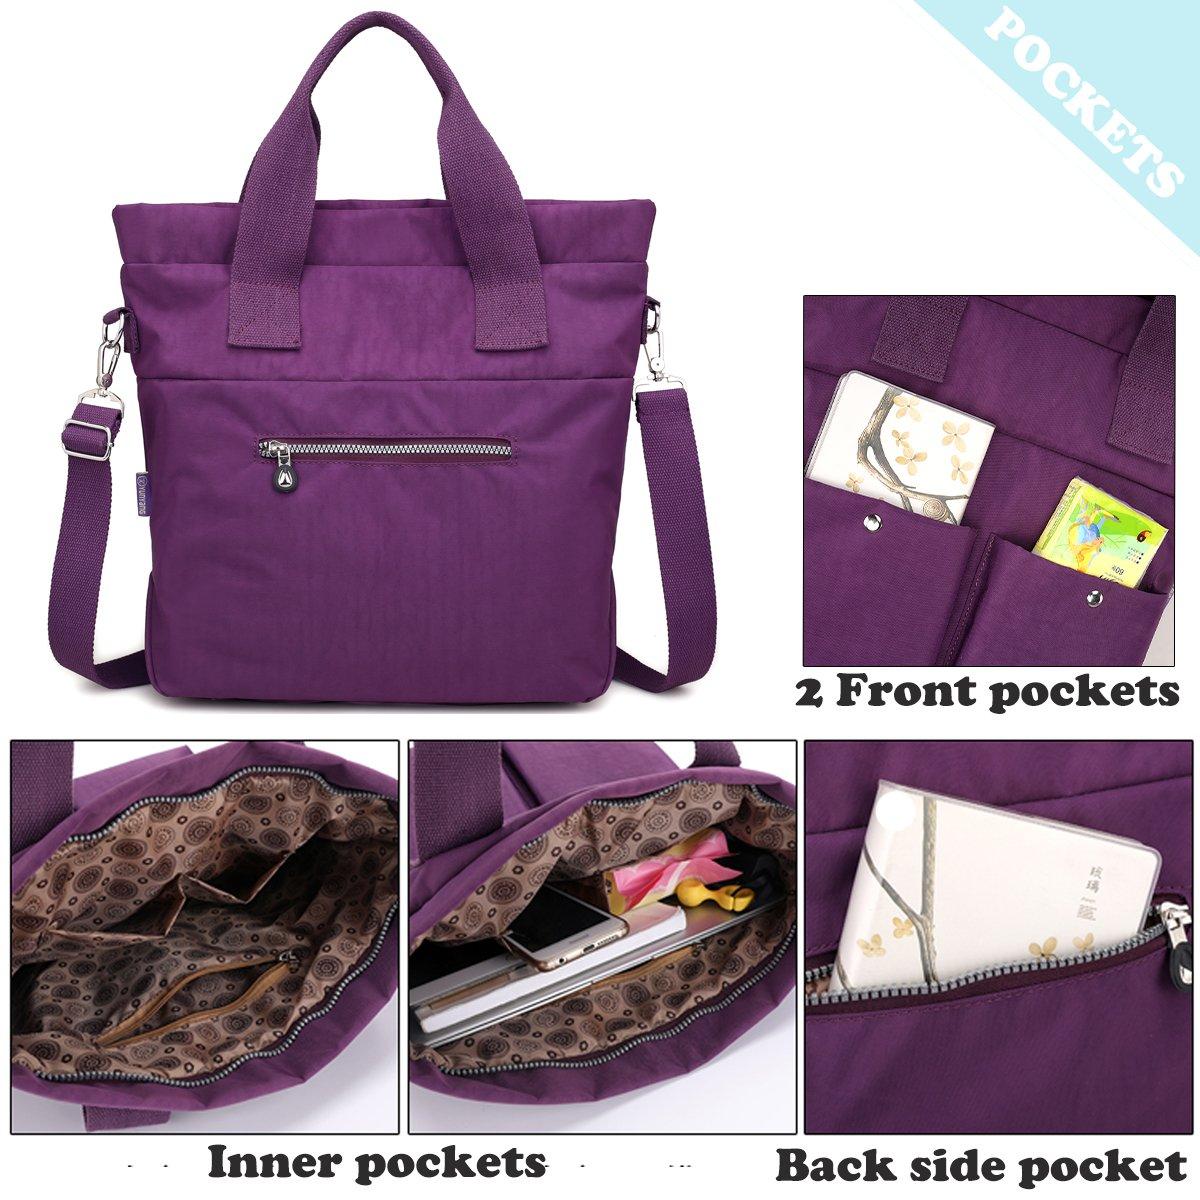 Women Nylon Shoulder Bag Satchel Handbag, Myhozee Water Repellent Travel Work Tote Bag Cross body Bag by Myhozee (Image #4)